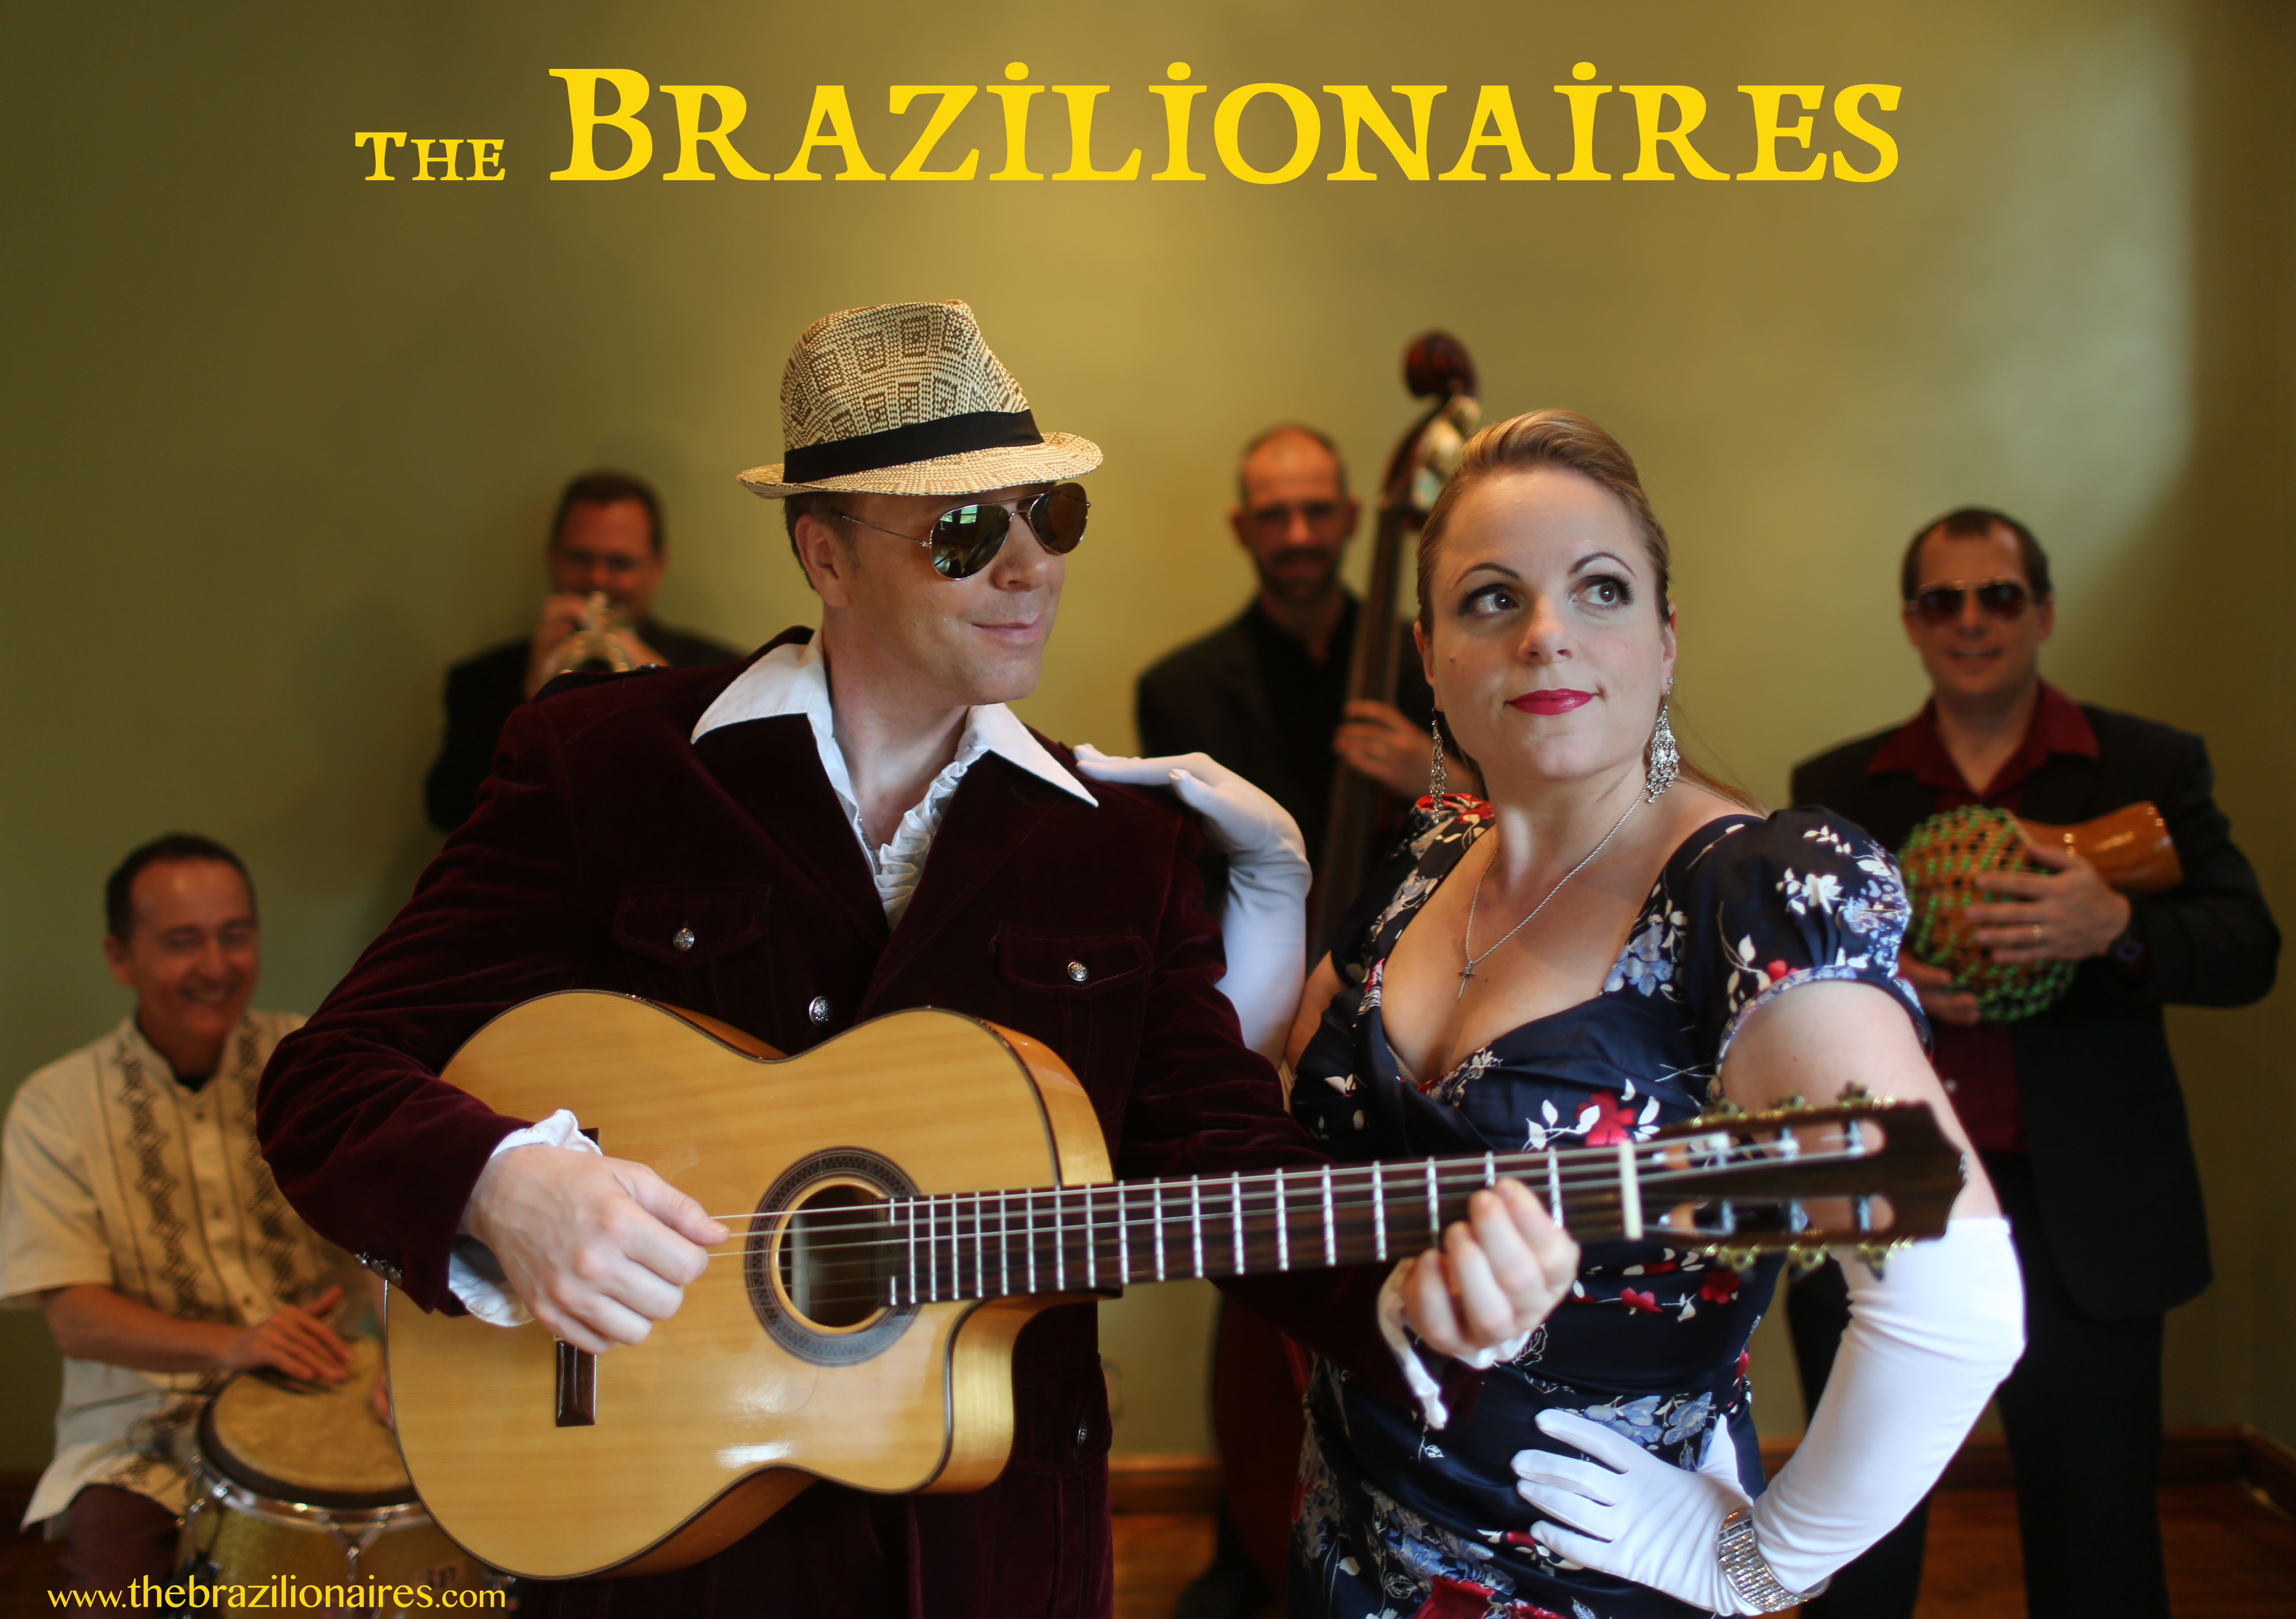 The BraziLionaires